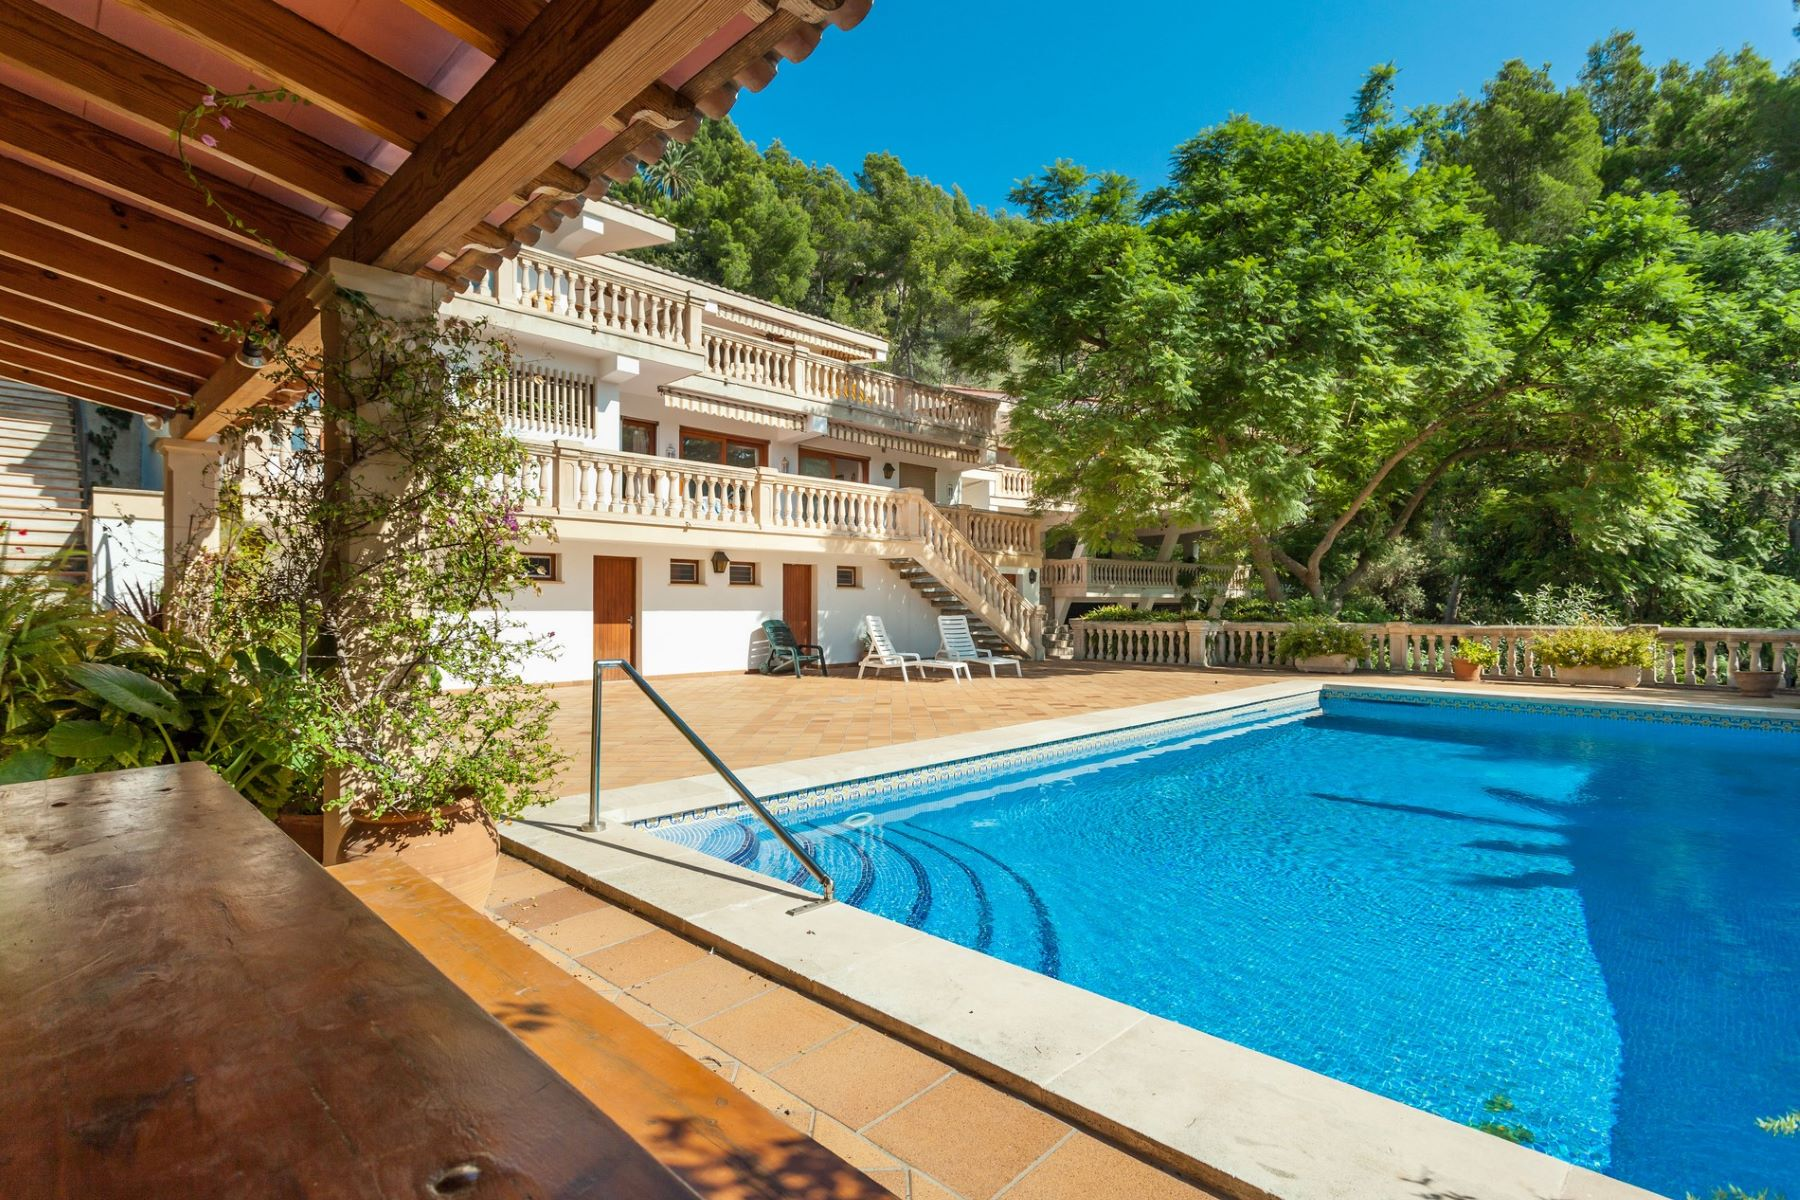 独户住宅 为 销售 在 Californian style villa in Son Vida Son Vida, 巴利阿里群岛, 西班牙